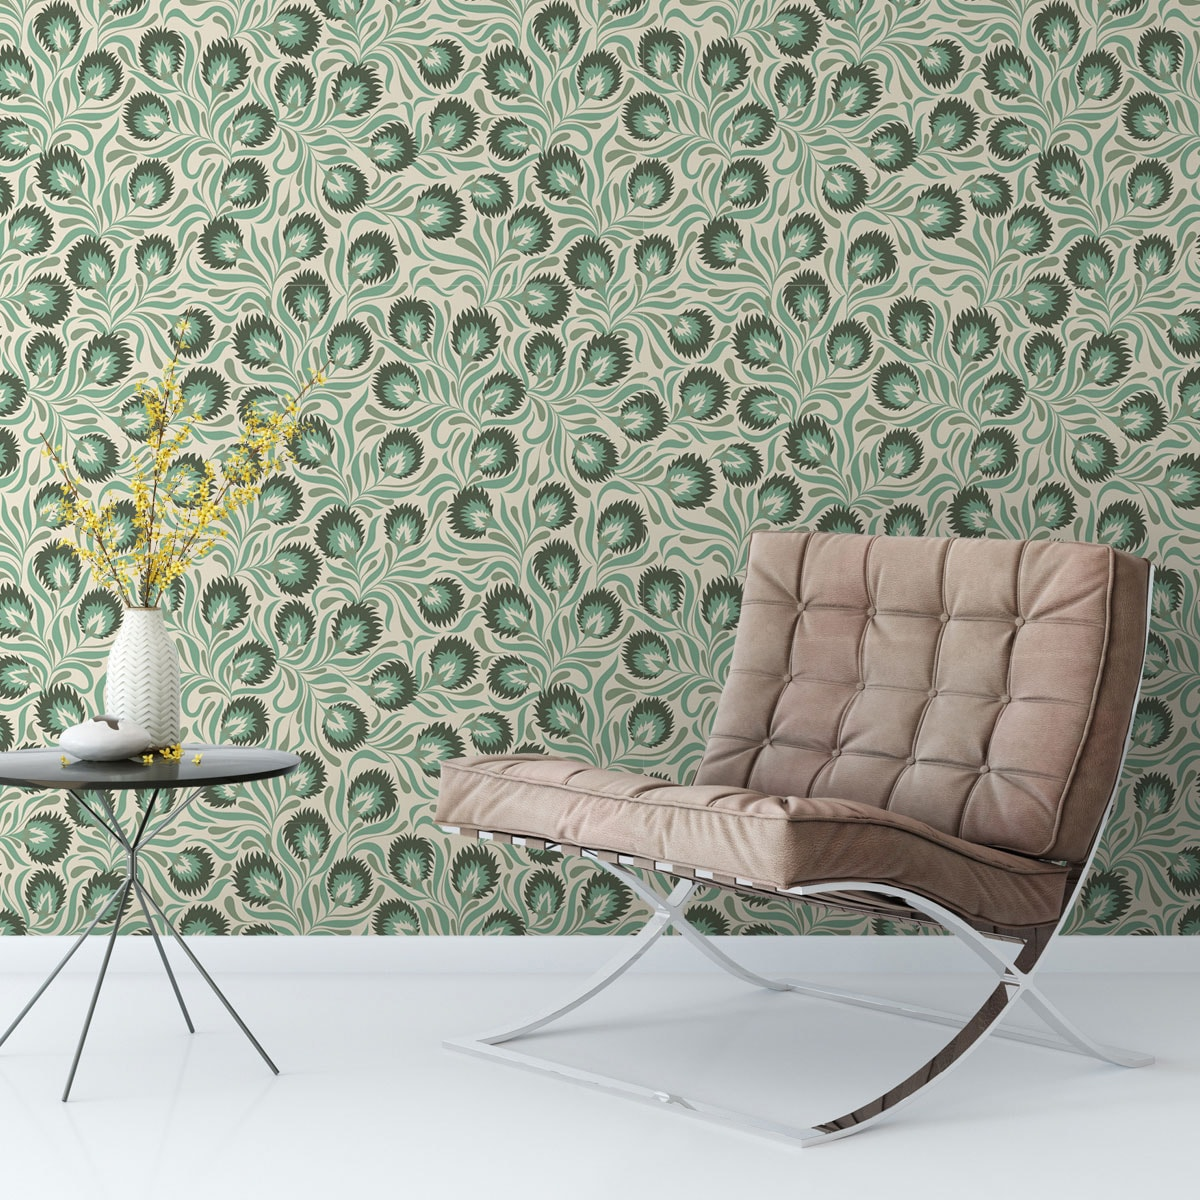 Feine Jugendstil Tapete mit großen Blüten in grün angepasst an Farrow & Ball Wandfarben - Vliestapete Blumen